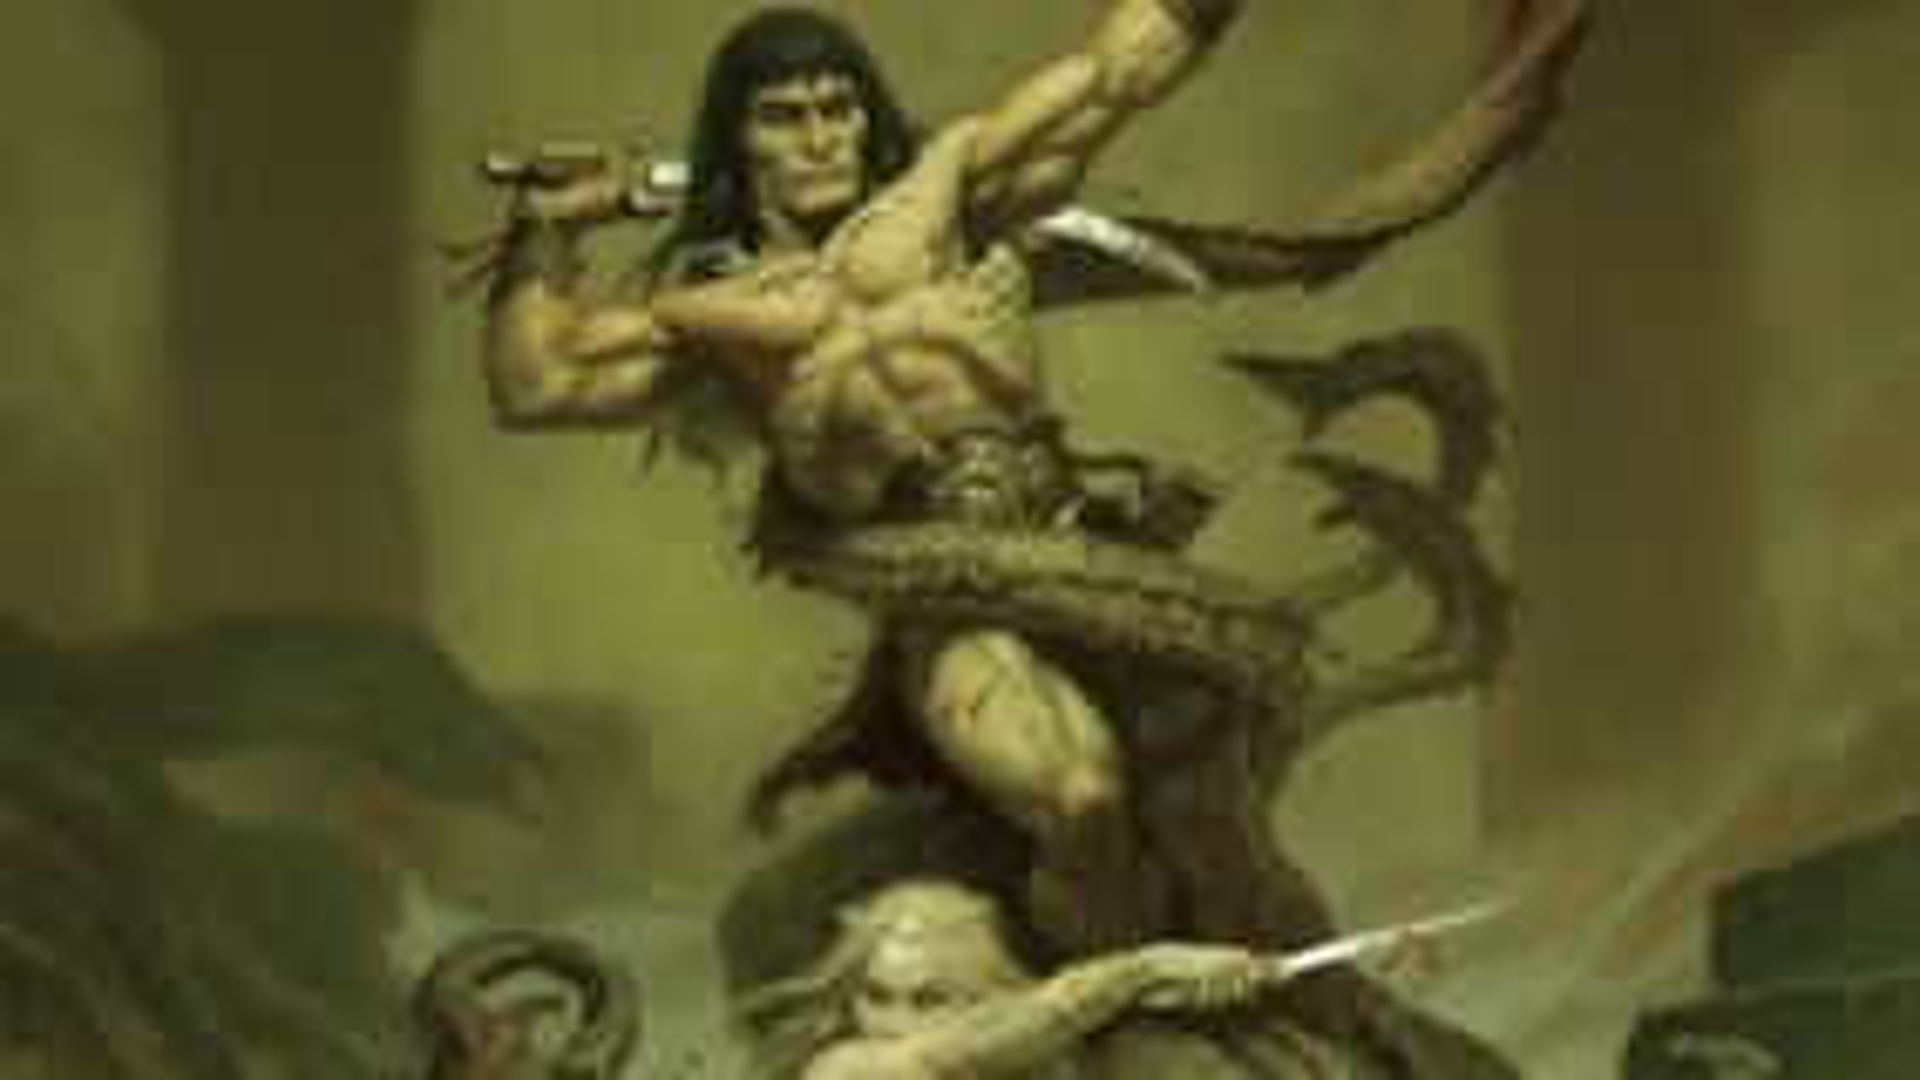 Conan RPG cover artwork